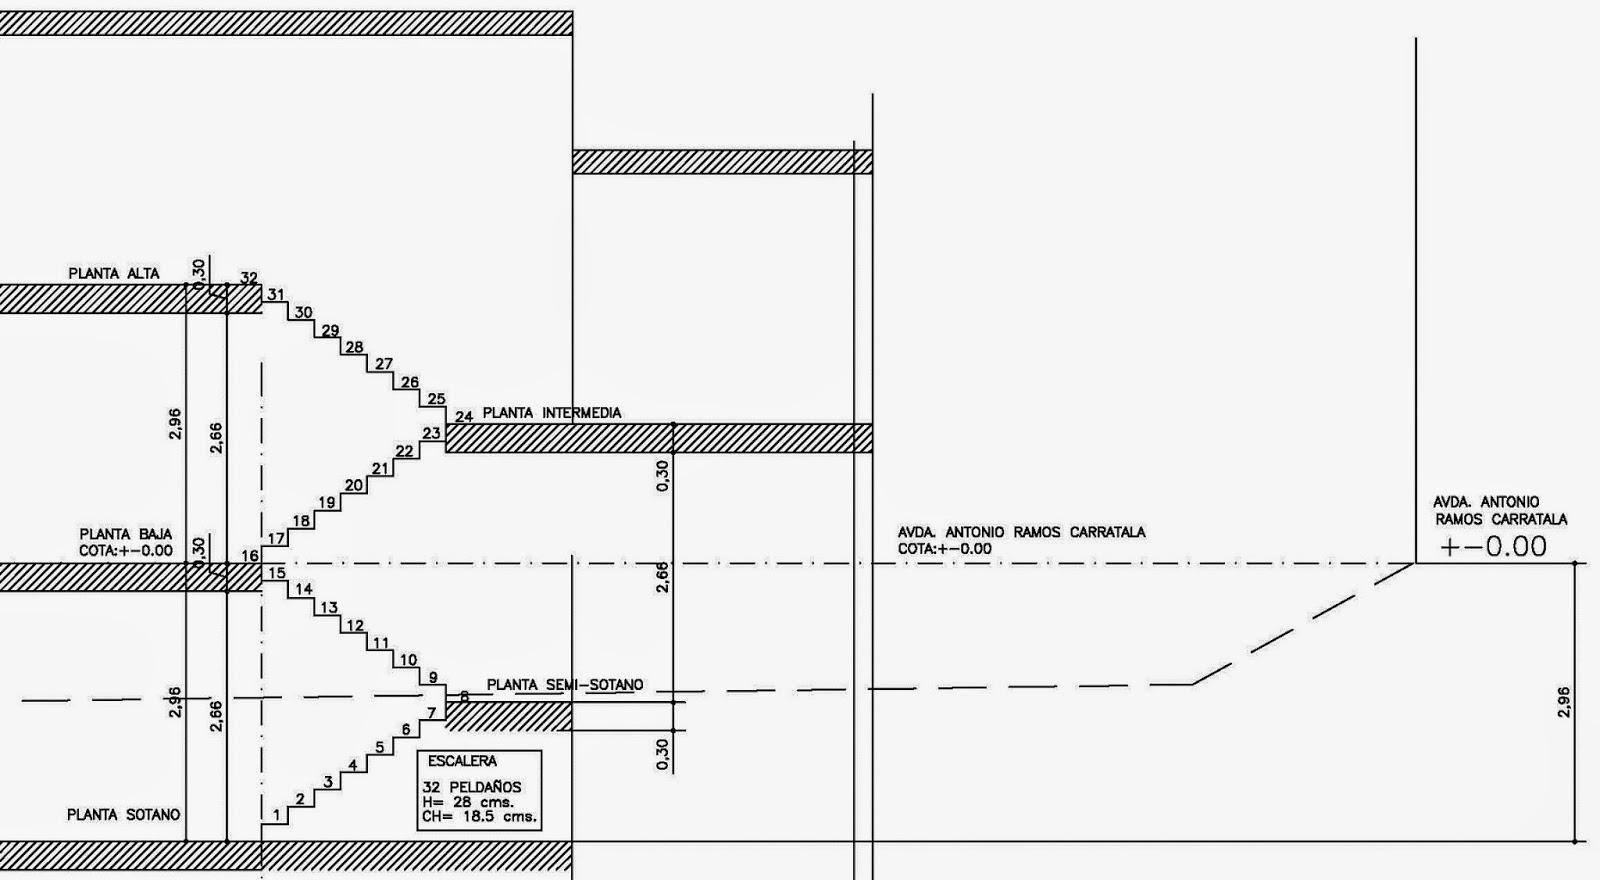 Rc i e s gran v a alicante trabajo 8 calculo escalera for Escaleras en planta